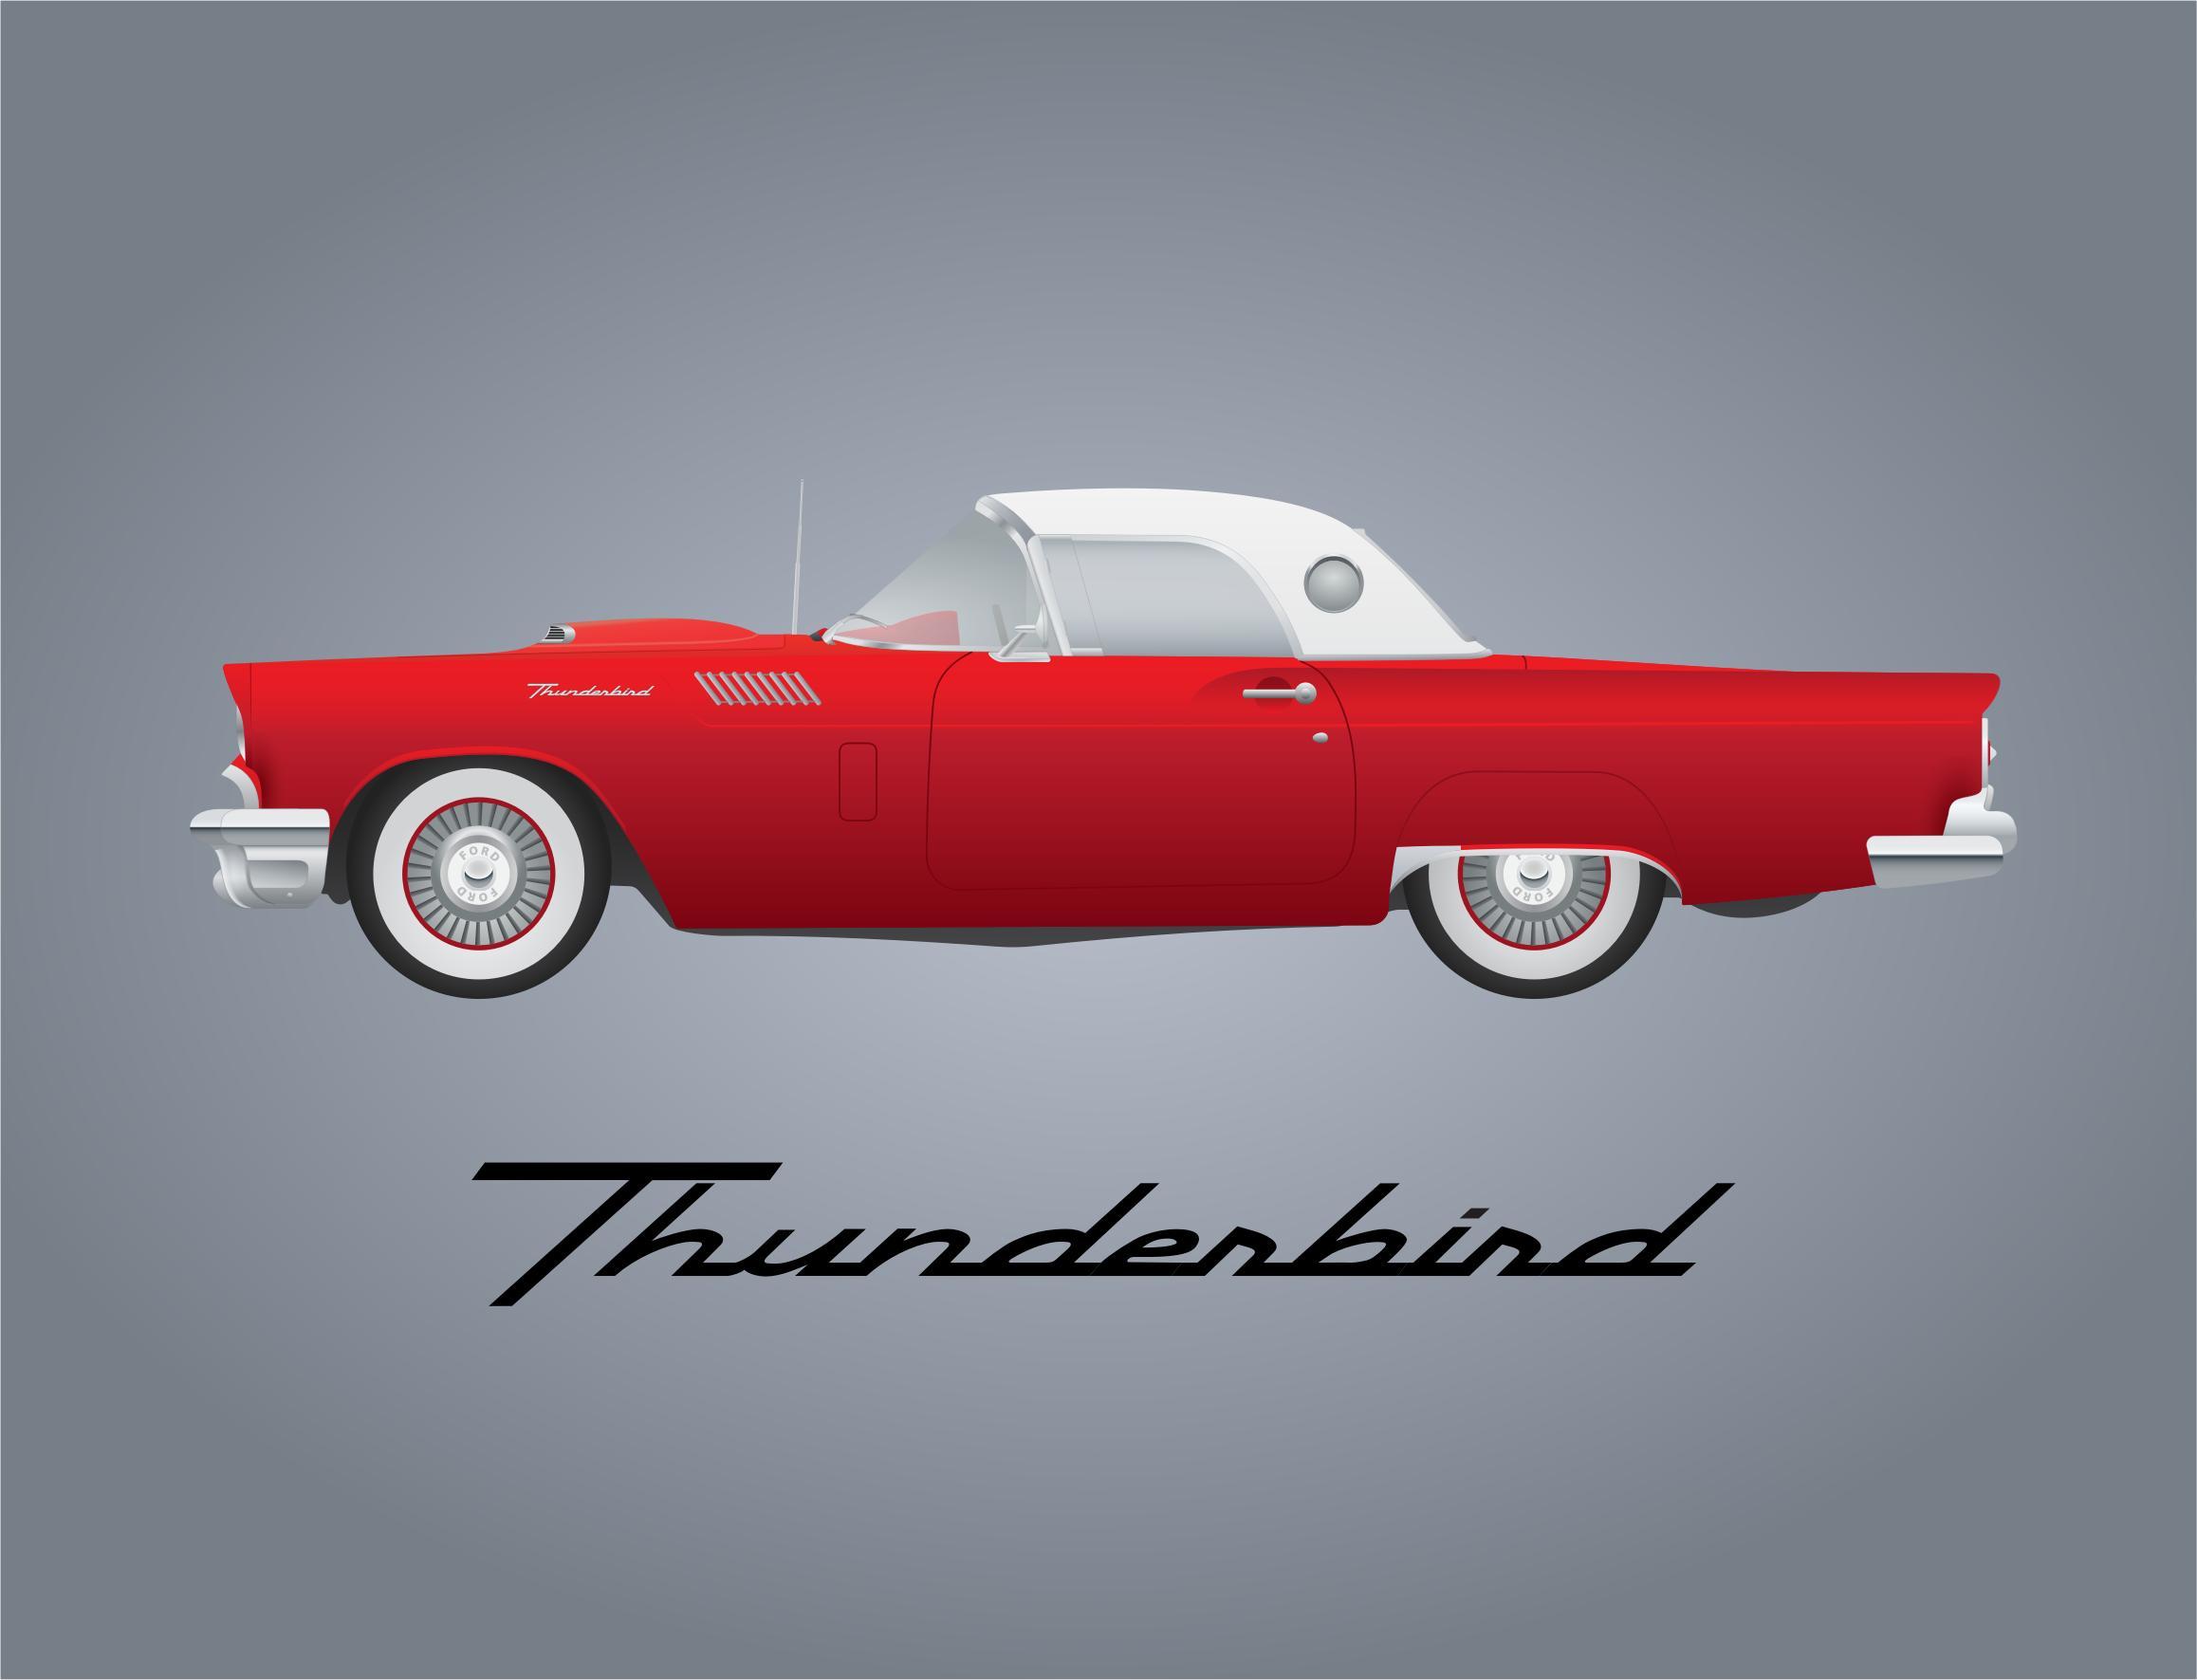 3 clipart thunderbird. Free bird icons png